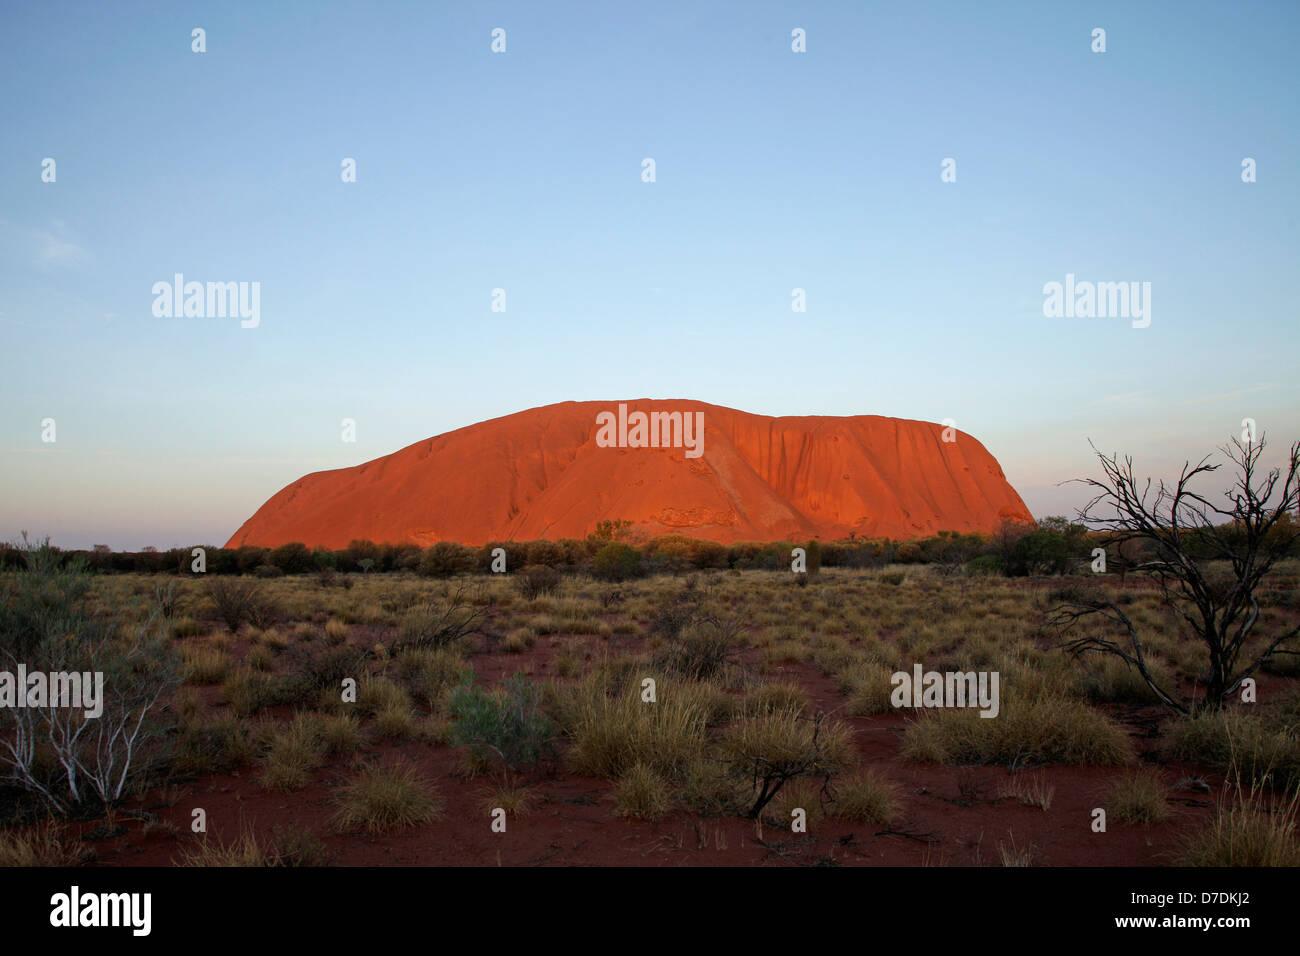 world-renowned sandstone formation Uluru or Ayers Rock , Northern Territory, Australia - Stock Image